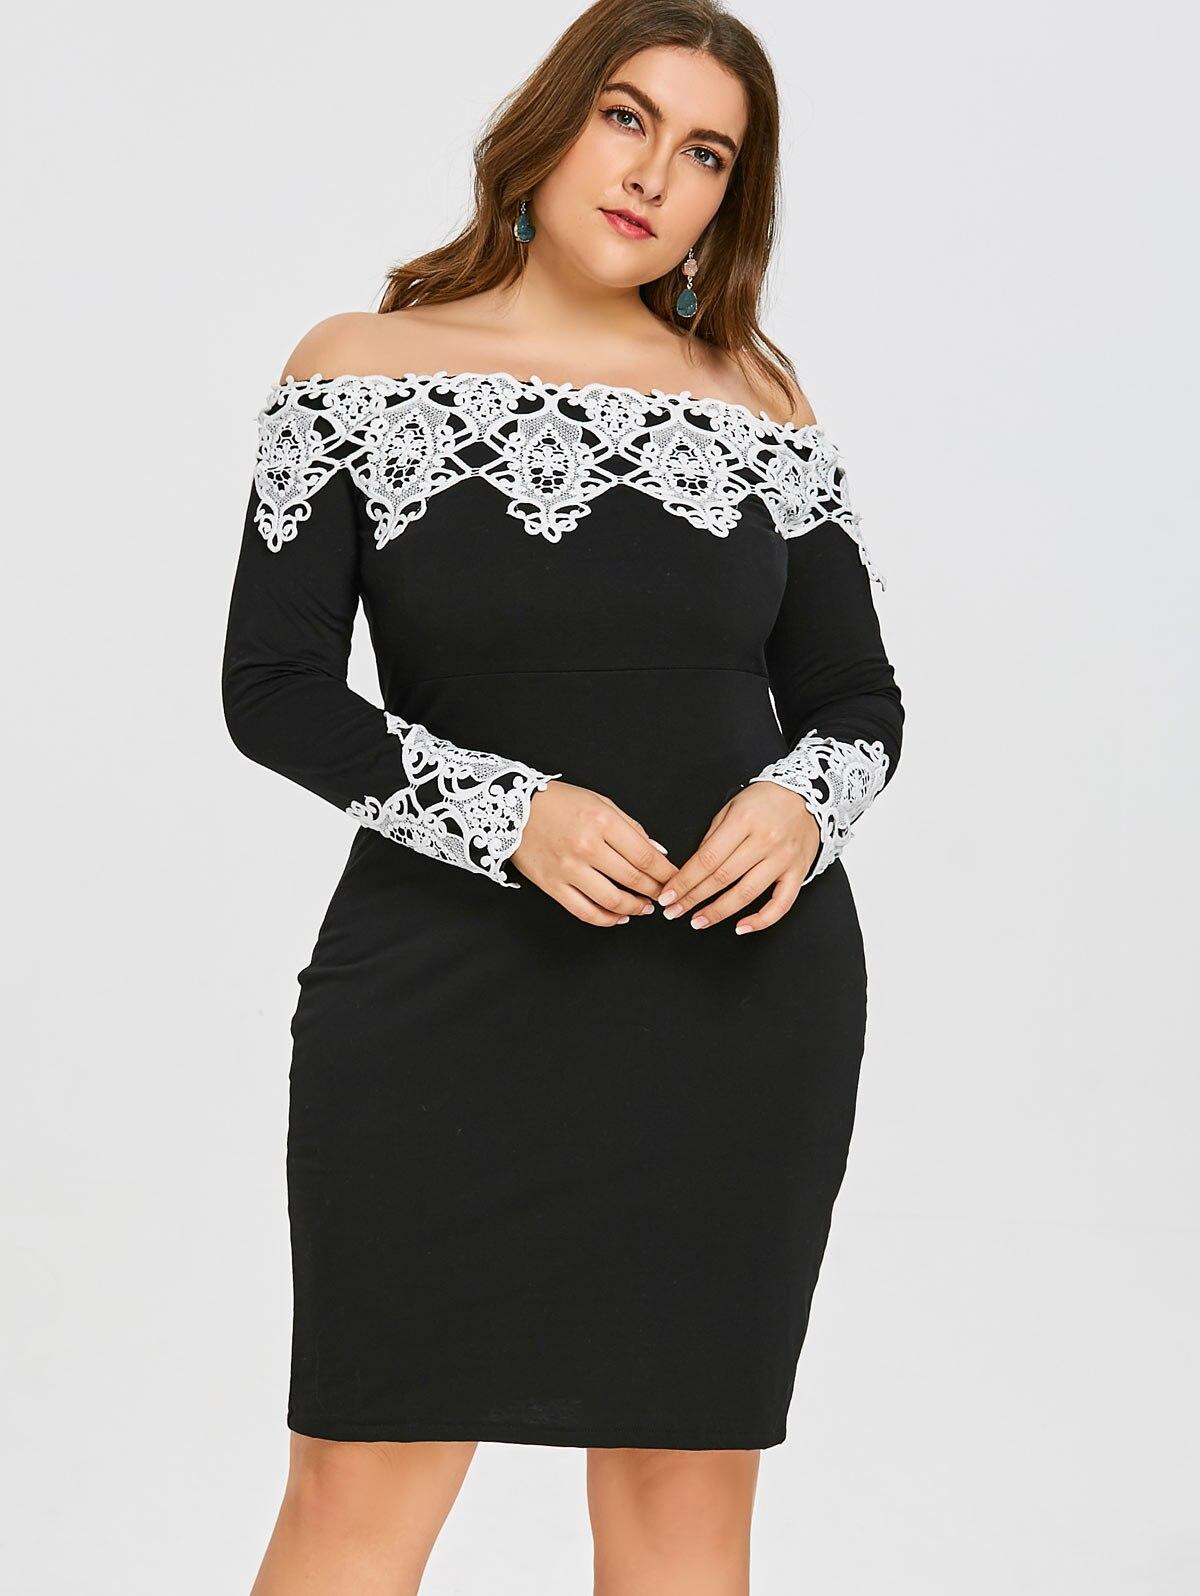 Gamiss Womens Elegant Plus Size Halter Neck Lace Capelet Dress